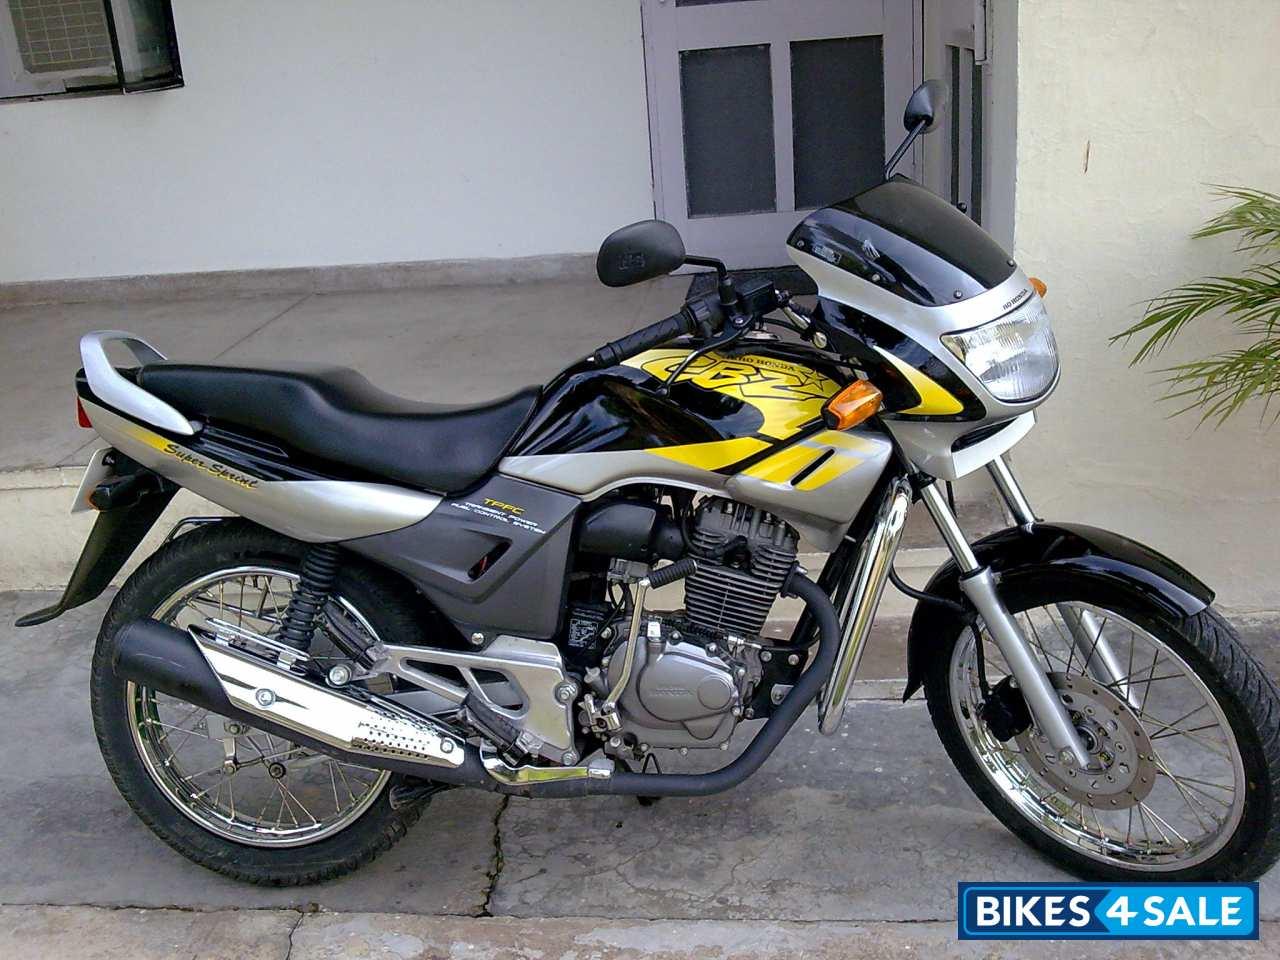 Star picture 1 album id is 76120 bike located in jammu bikes4sale